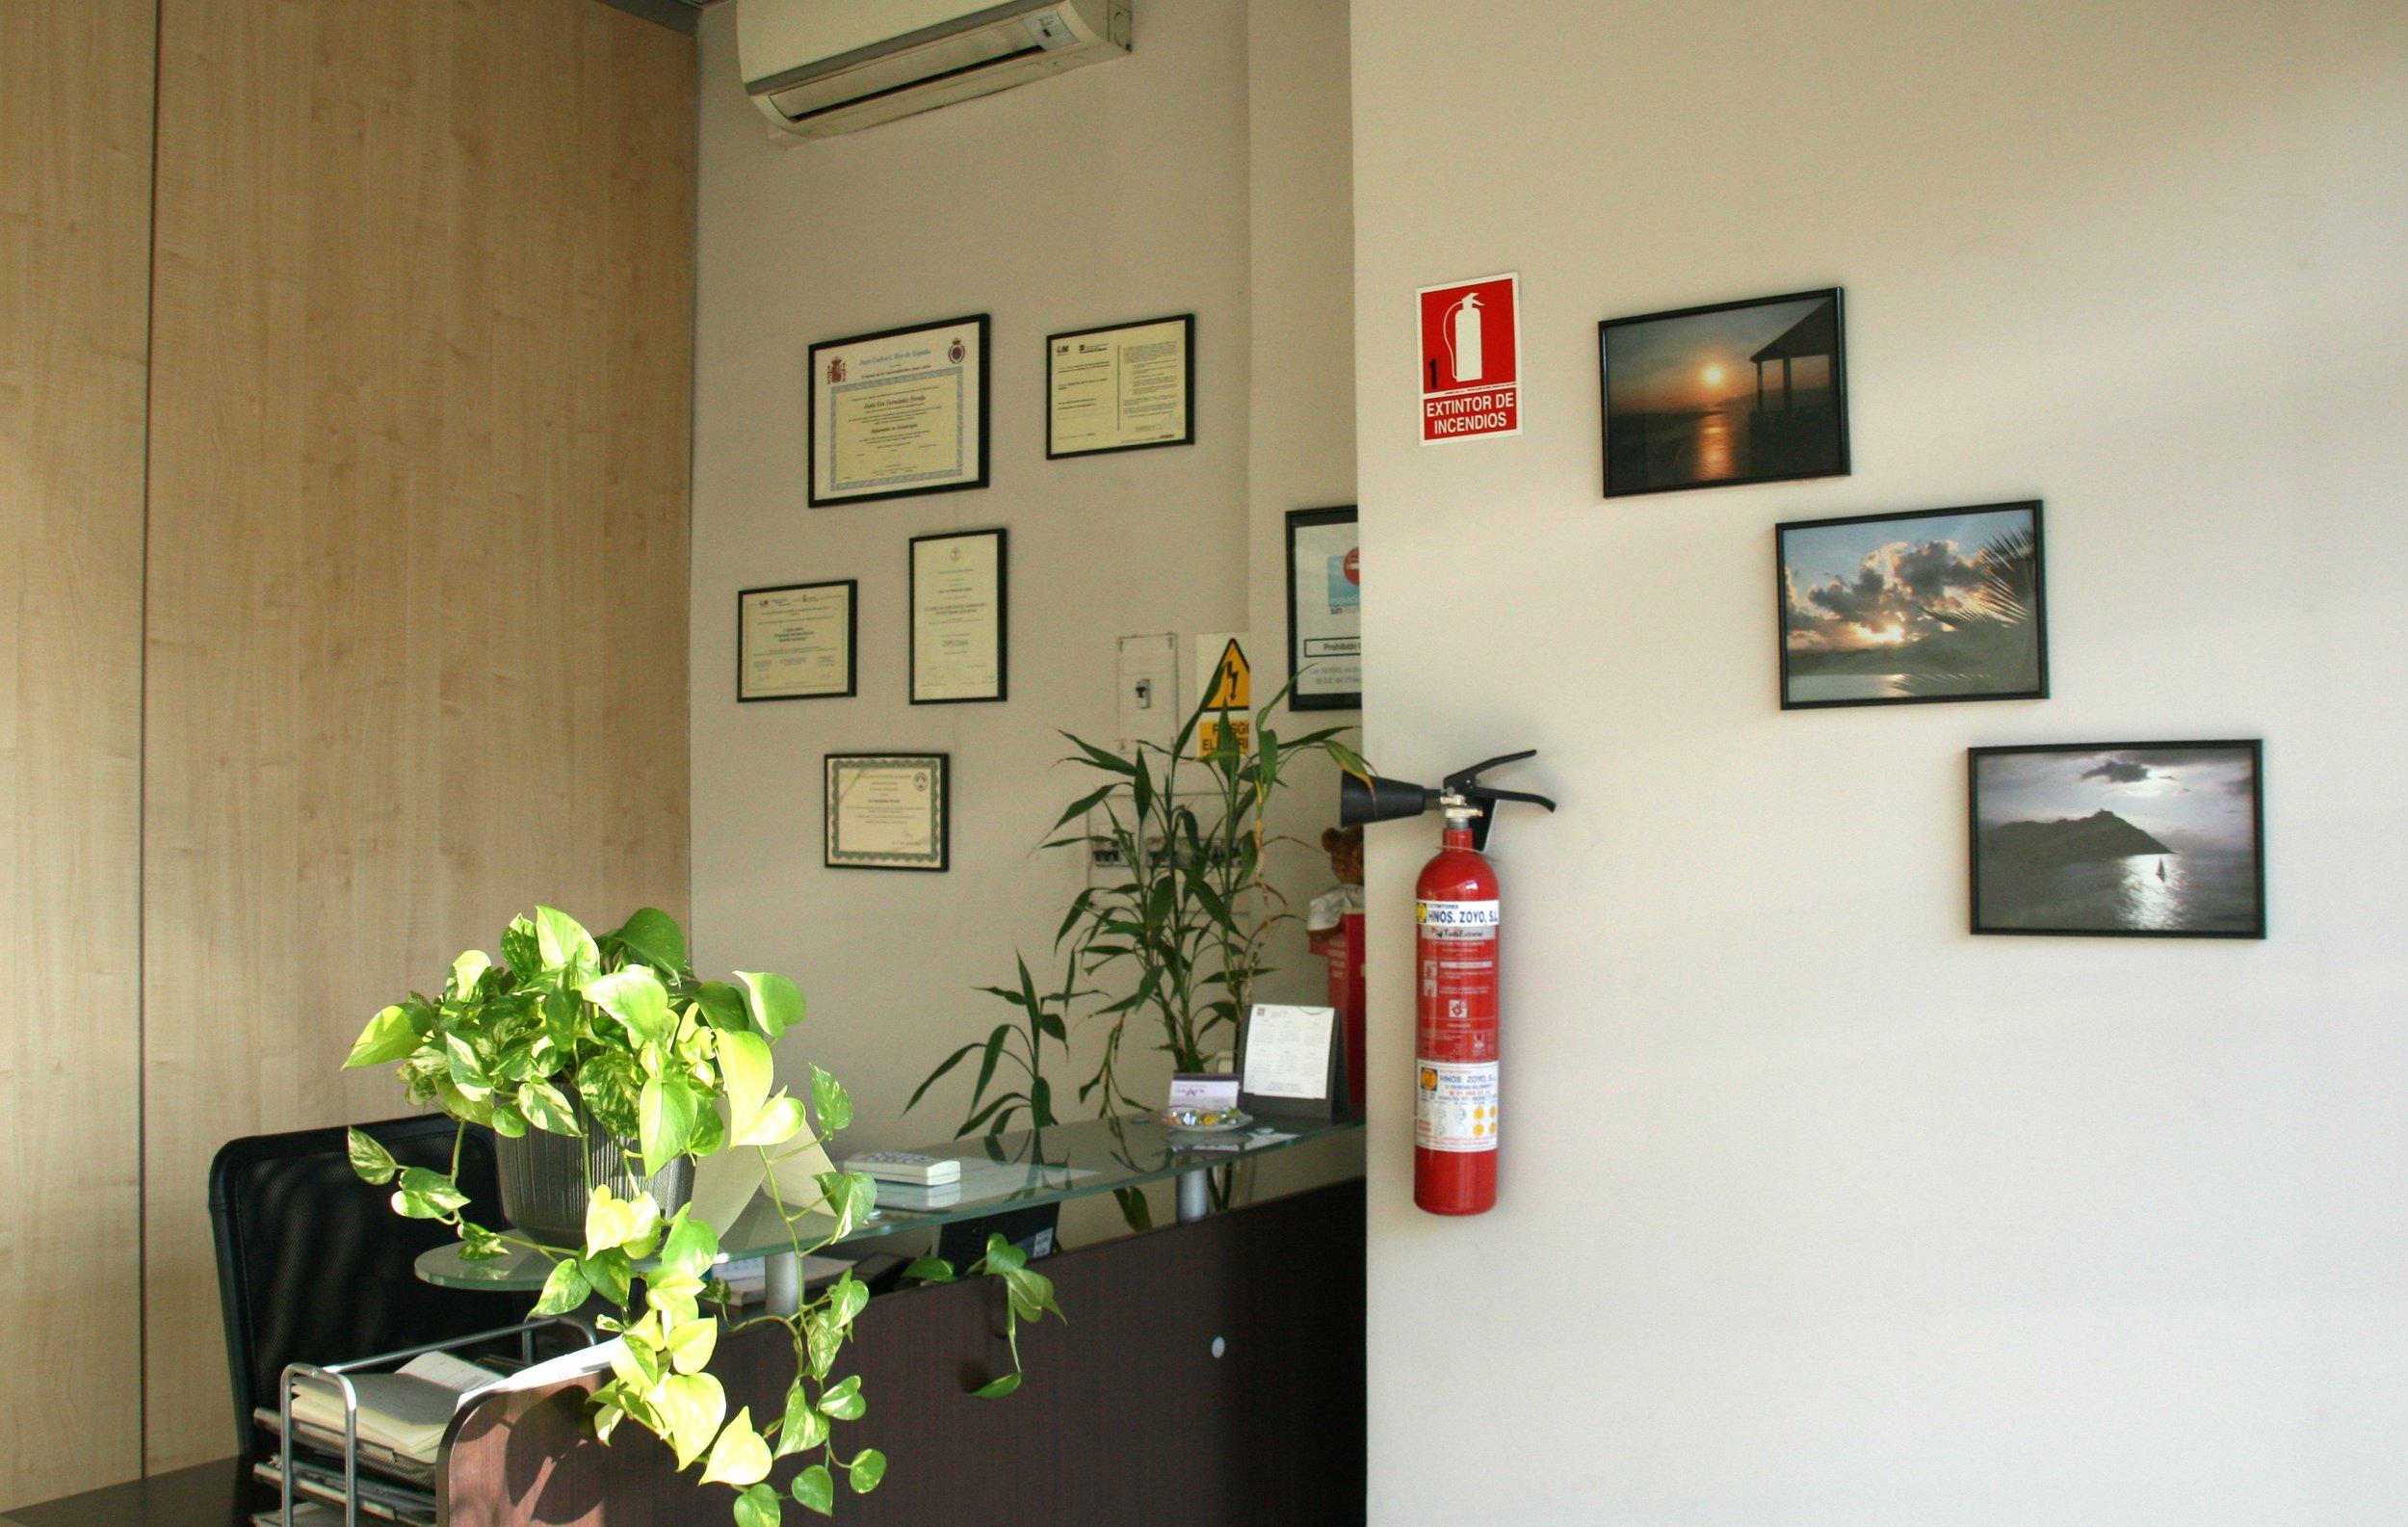 Centro de Fisioterapia CurArte   Fisioterapia, Osteopatía y Pilates en Madrid